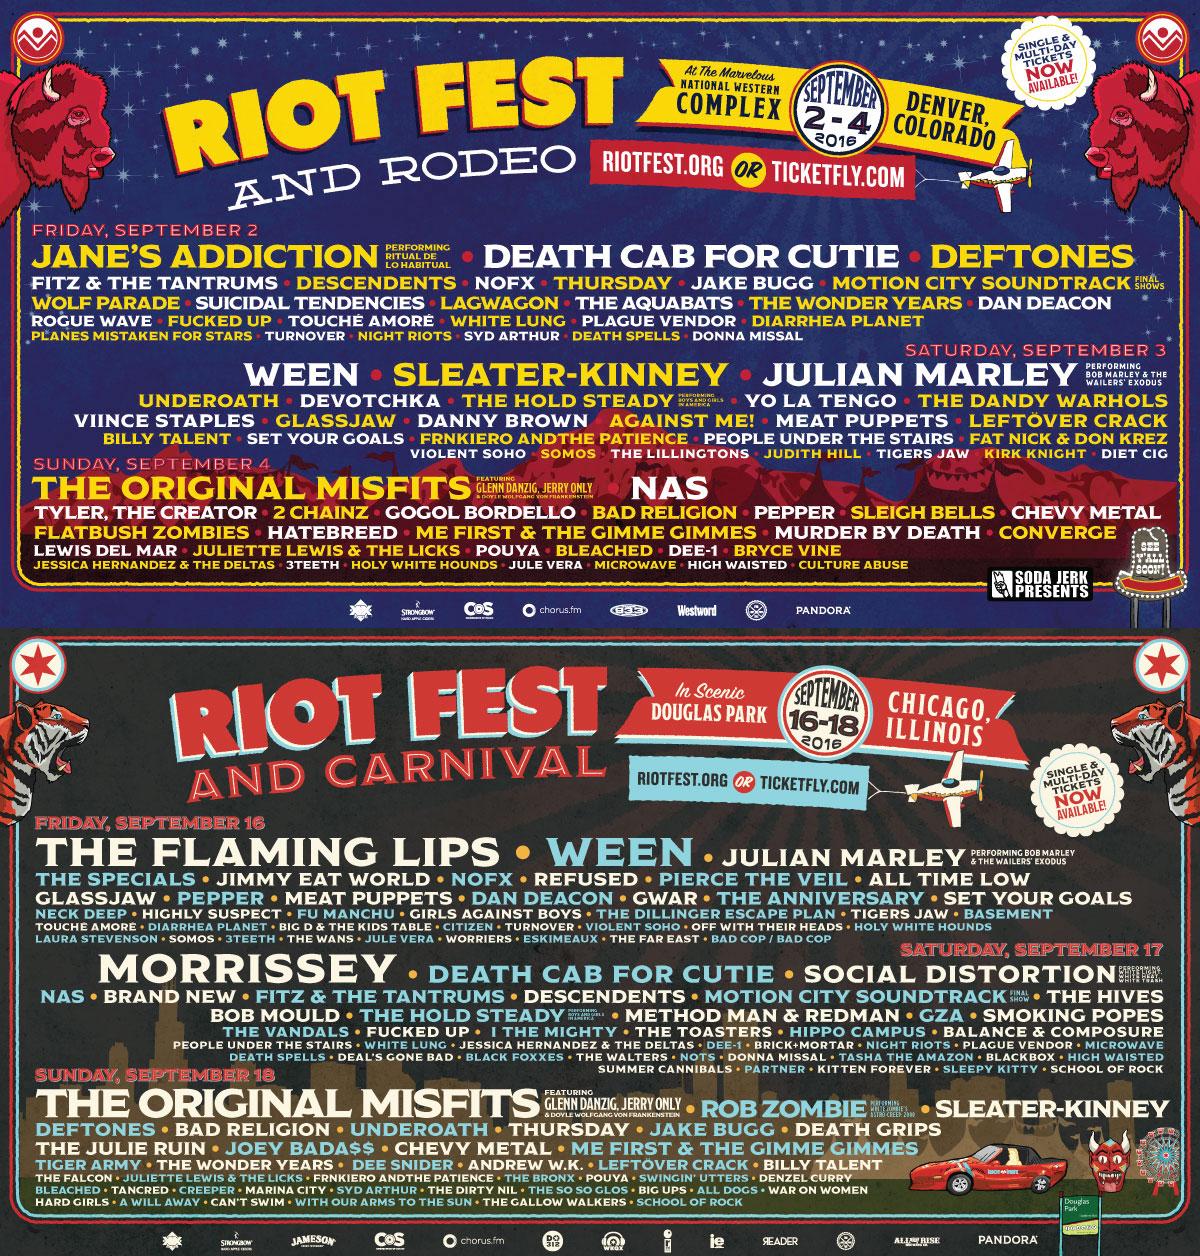 poster do riot fest 2016